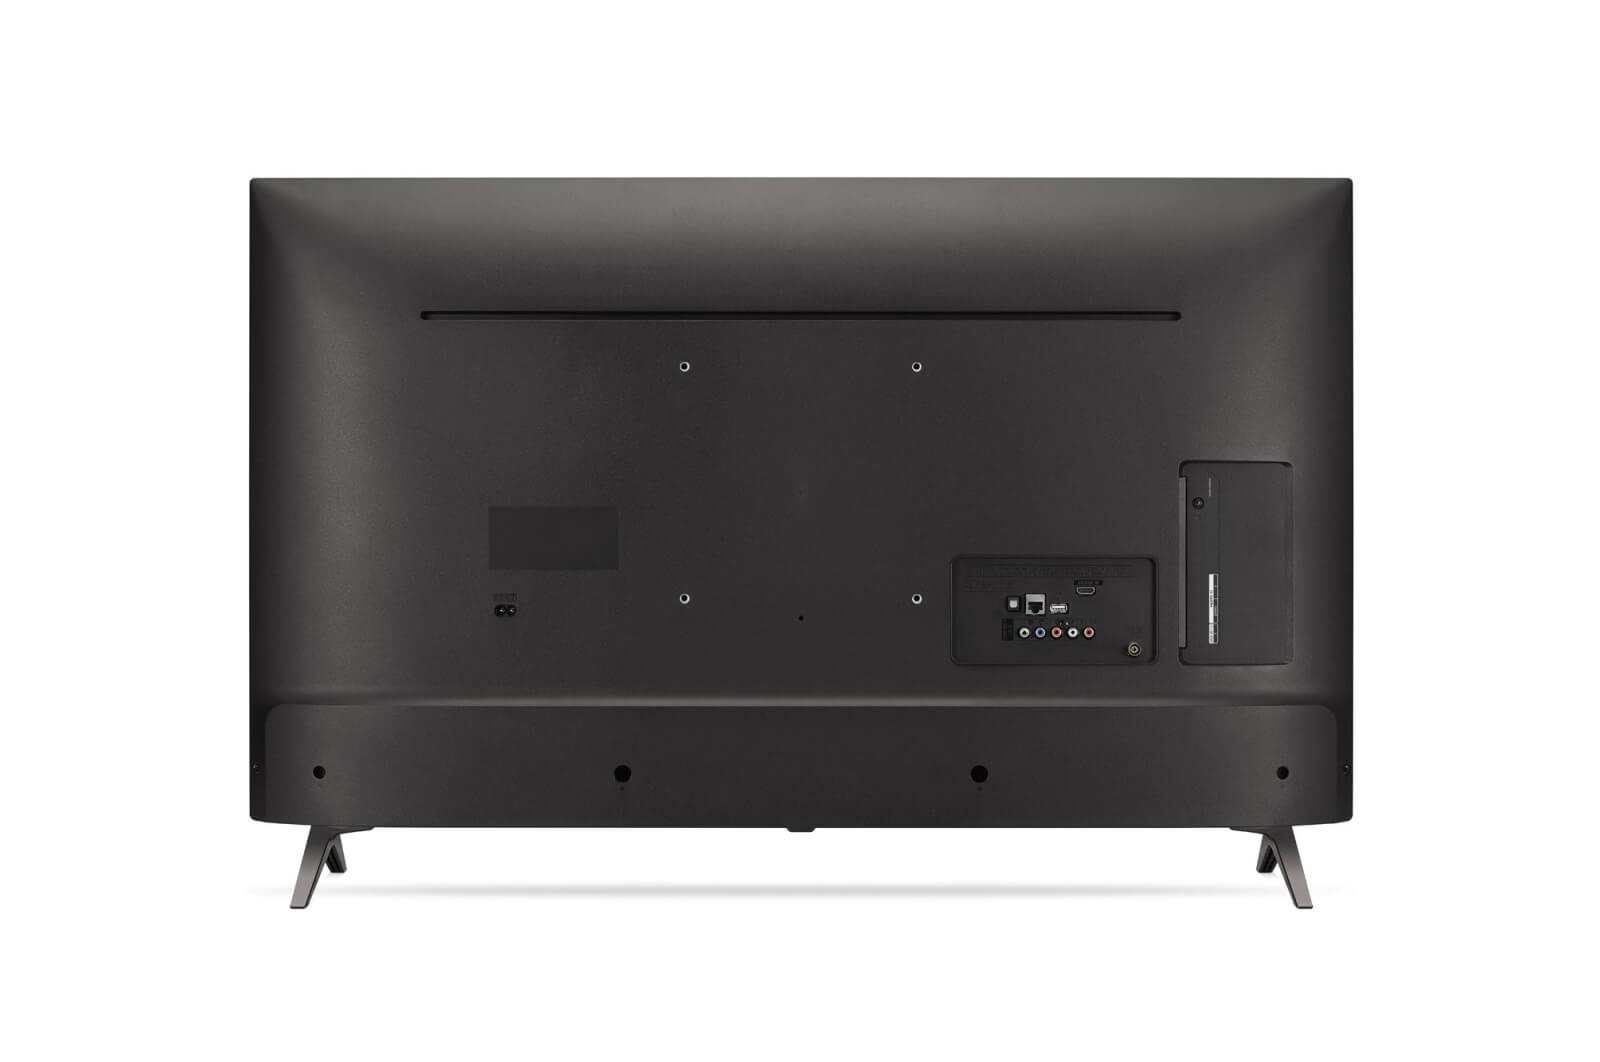 LG UK6300 ULTRA HD 4K TV Back